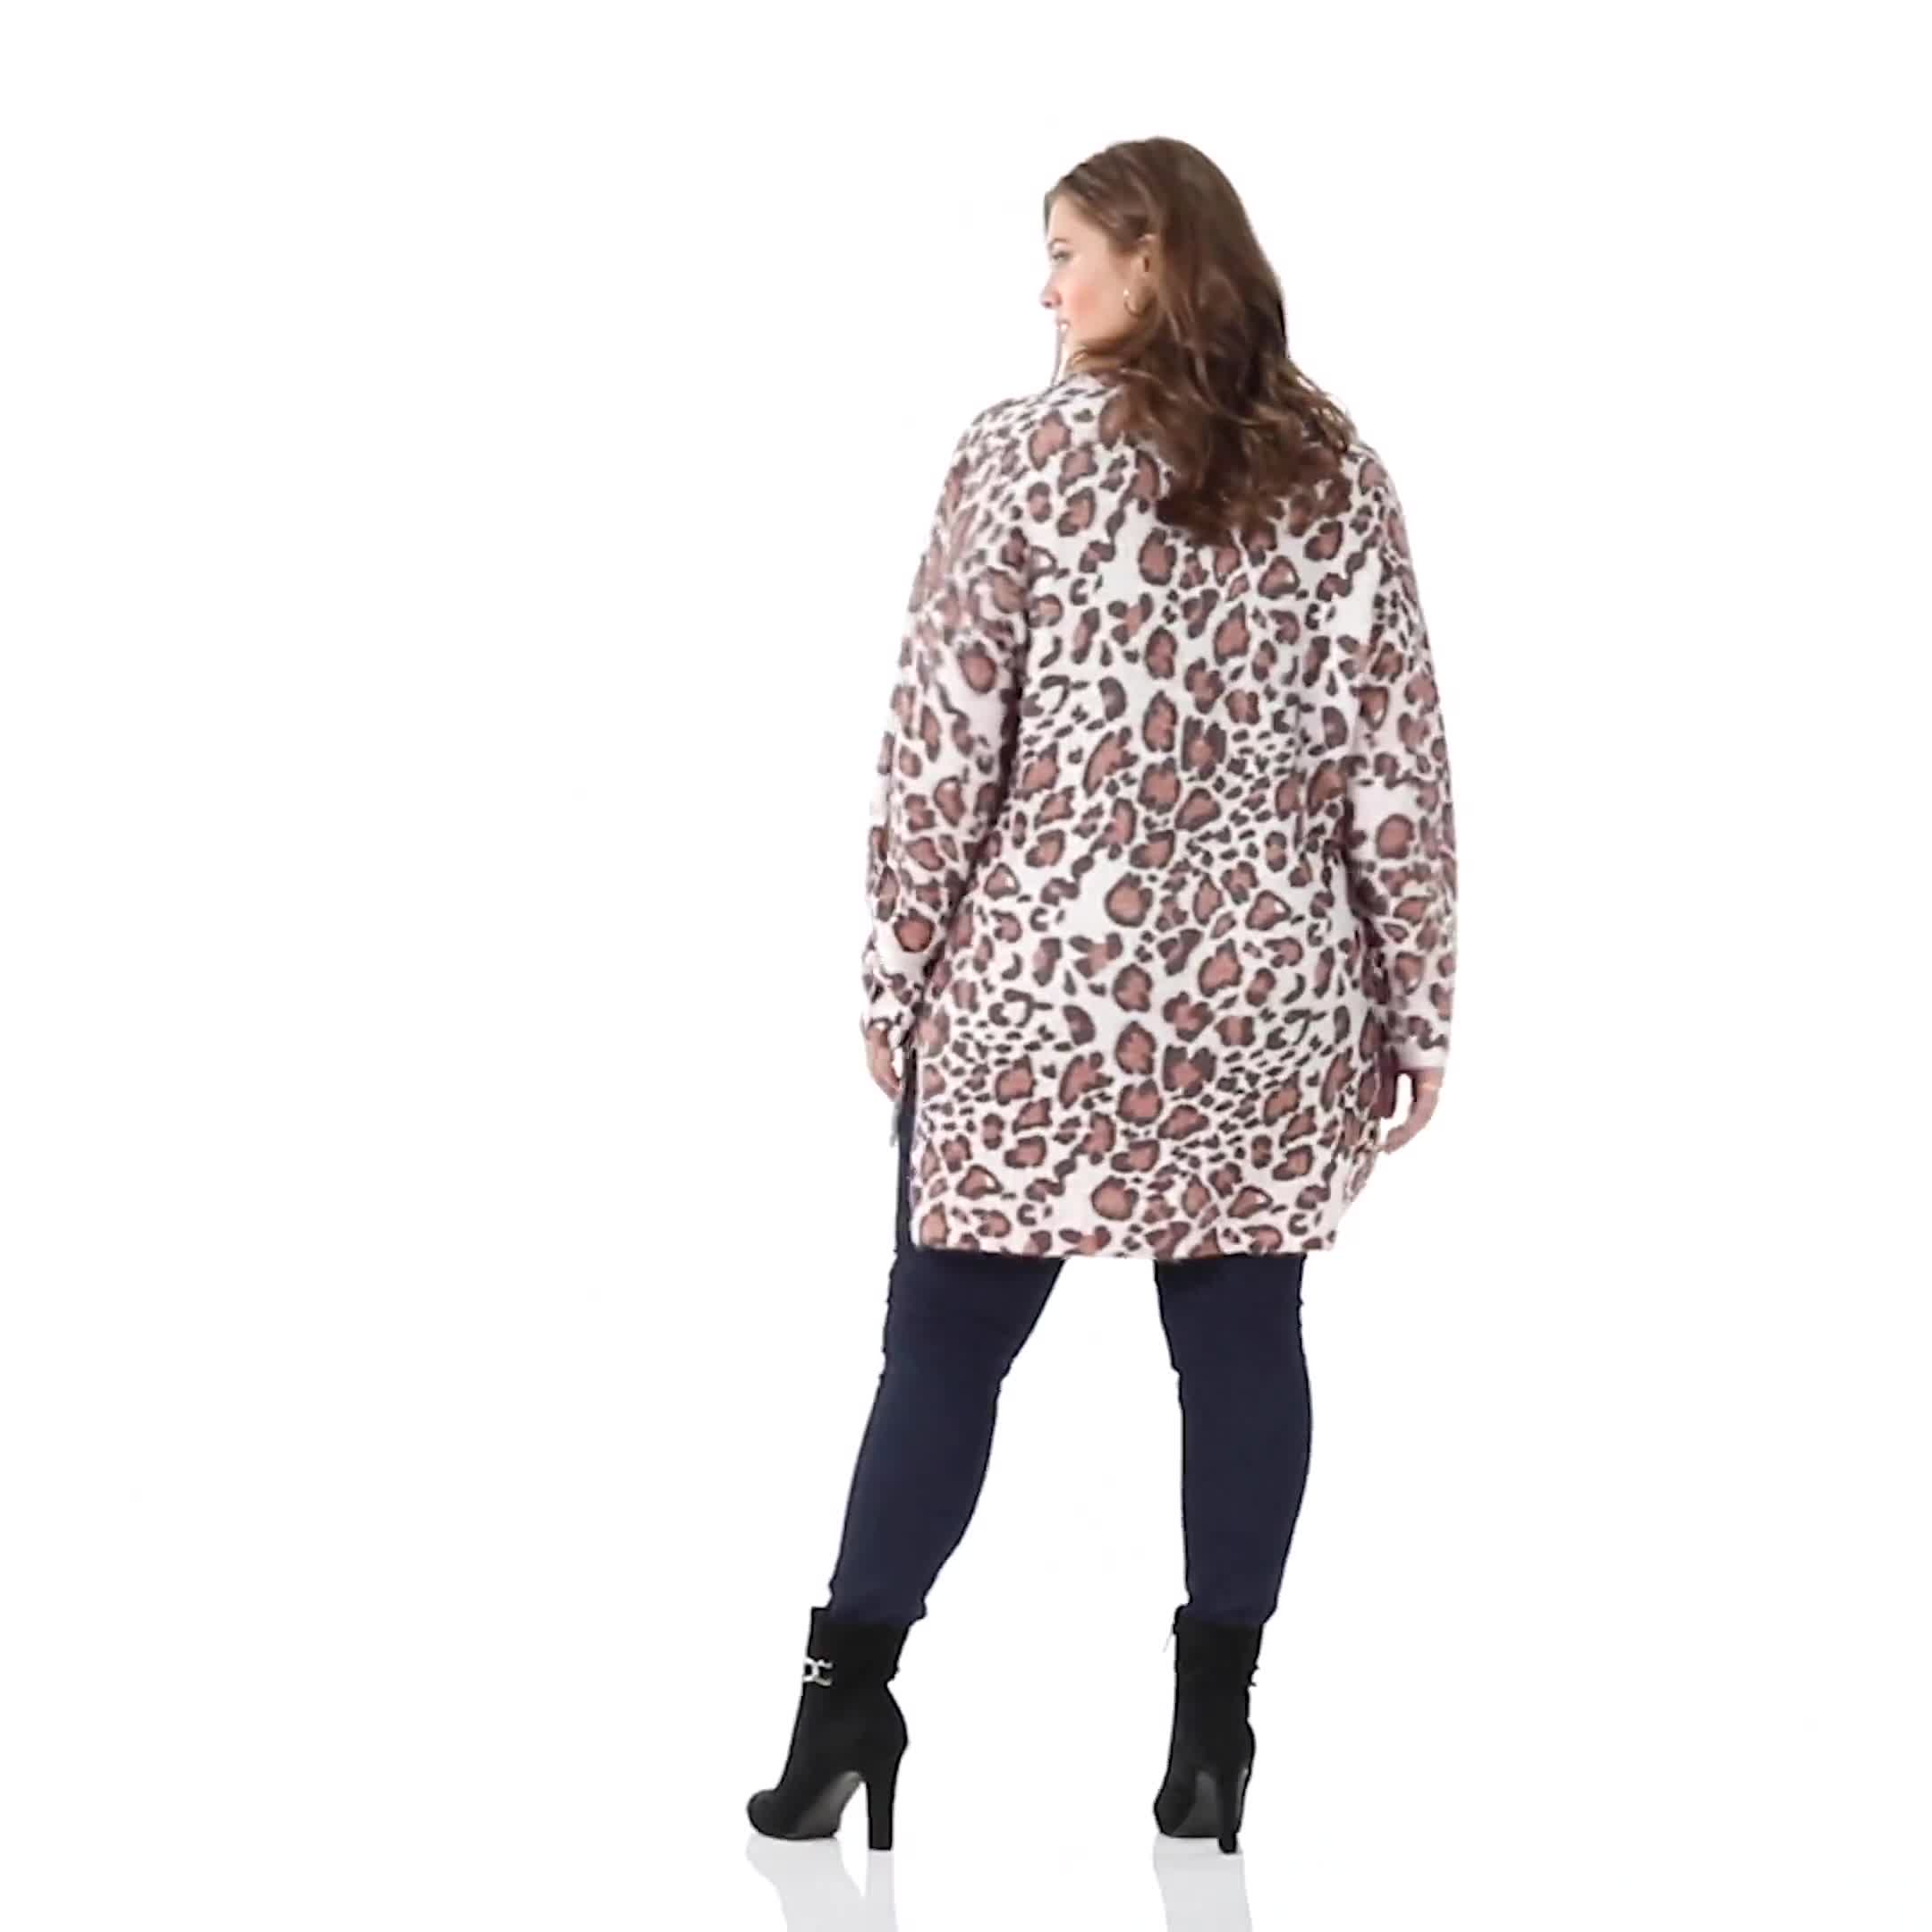 Roz & Ali Eyelash Animal Tunic Sweater - Plus - Video